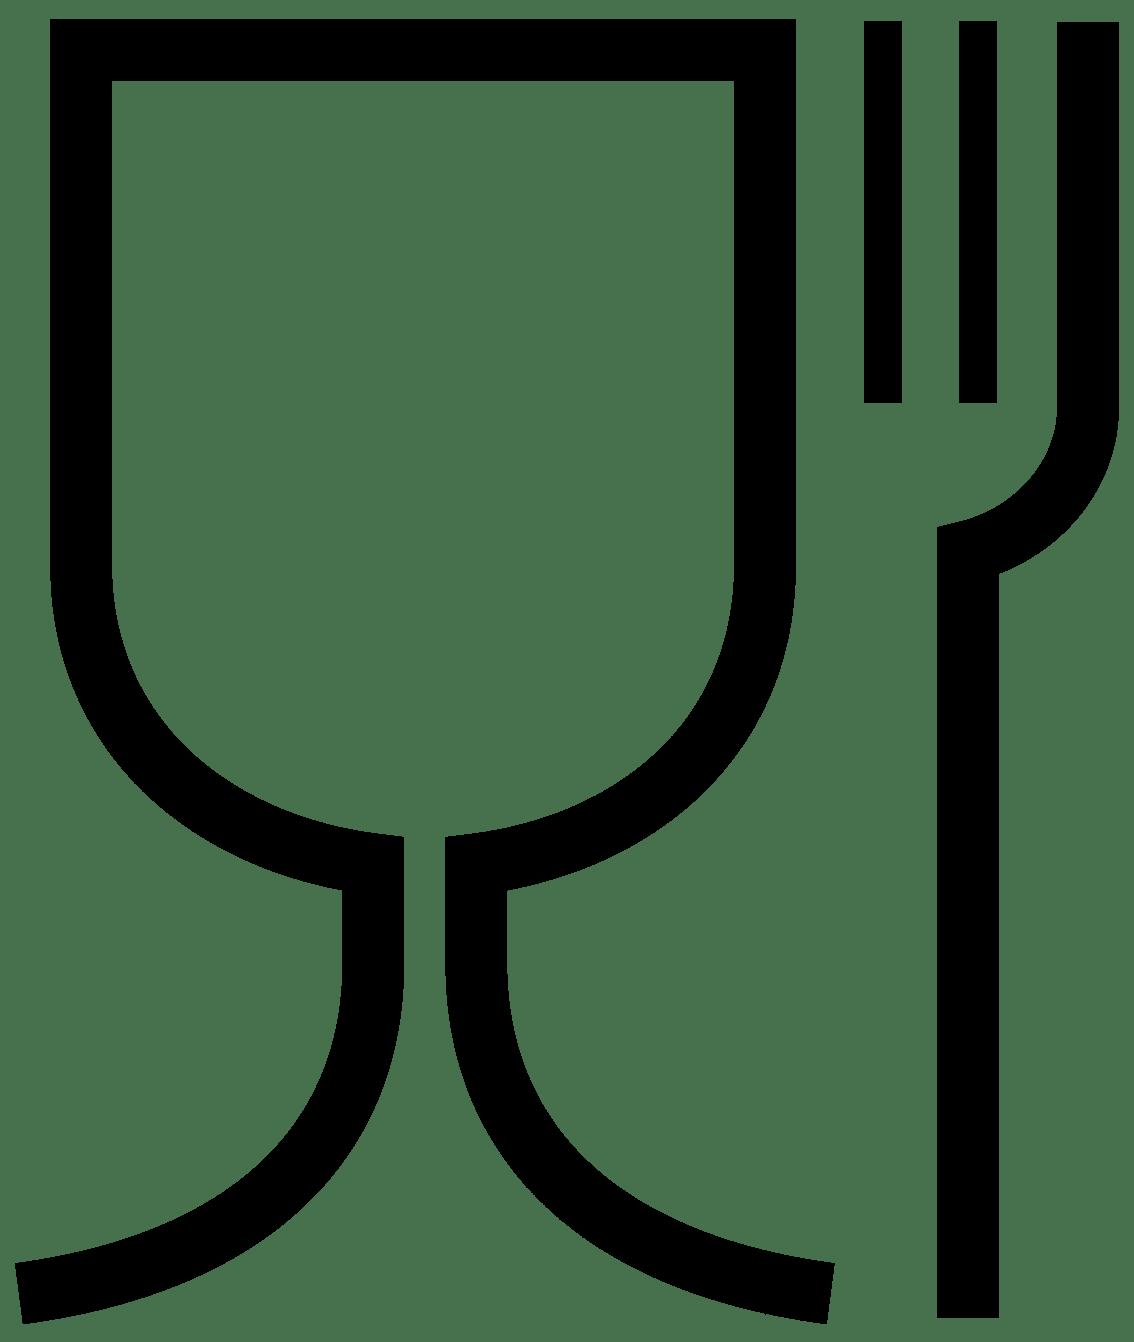 Food Safety Standard